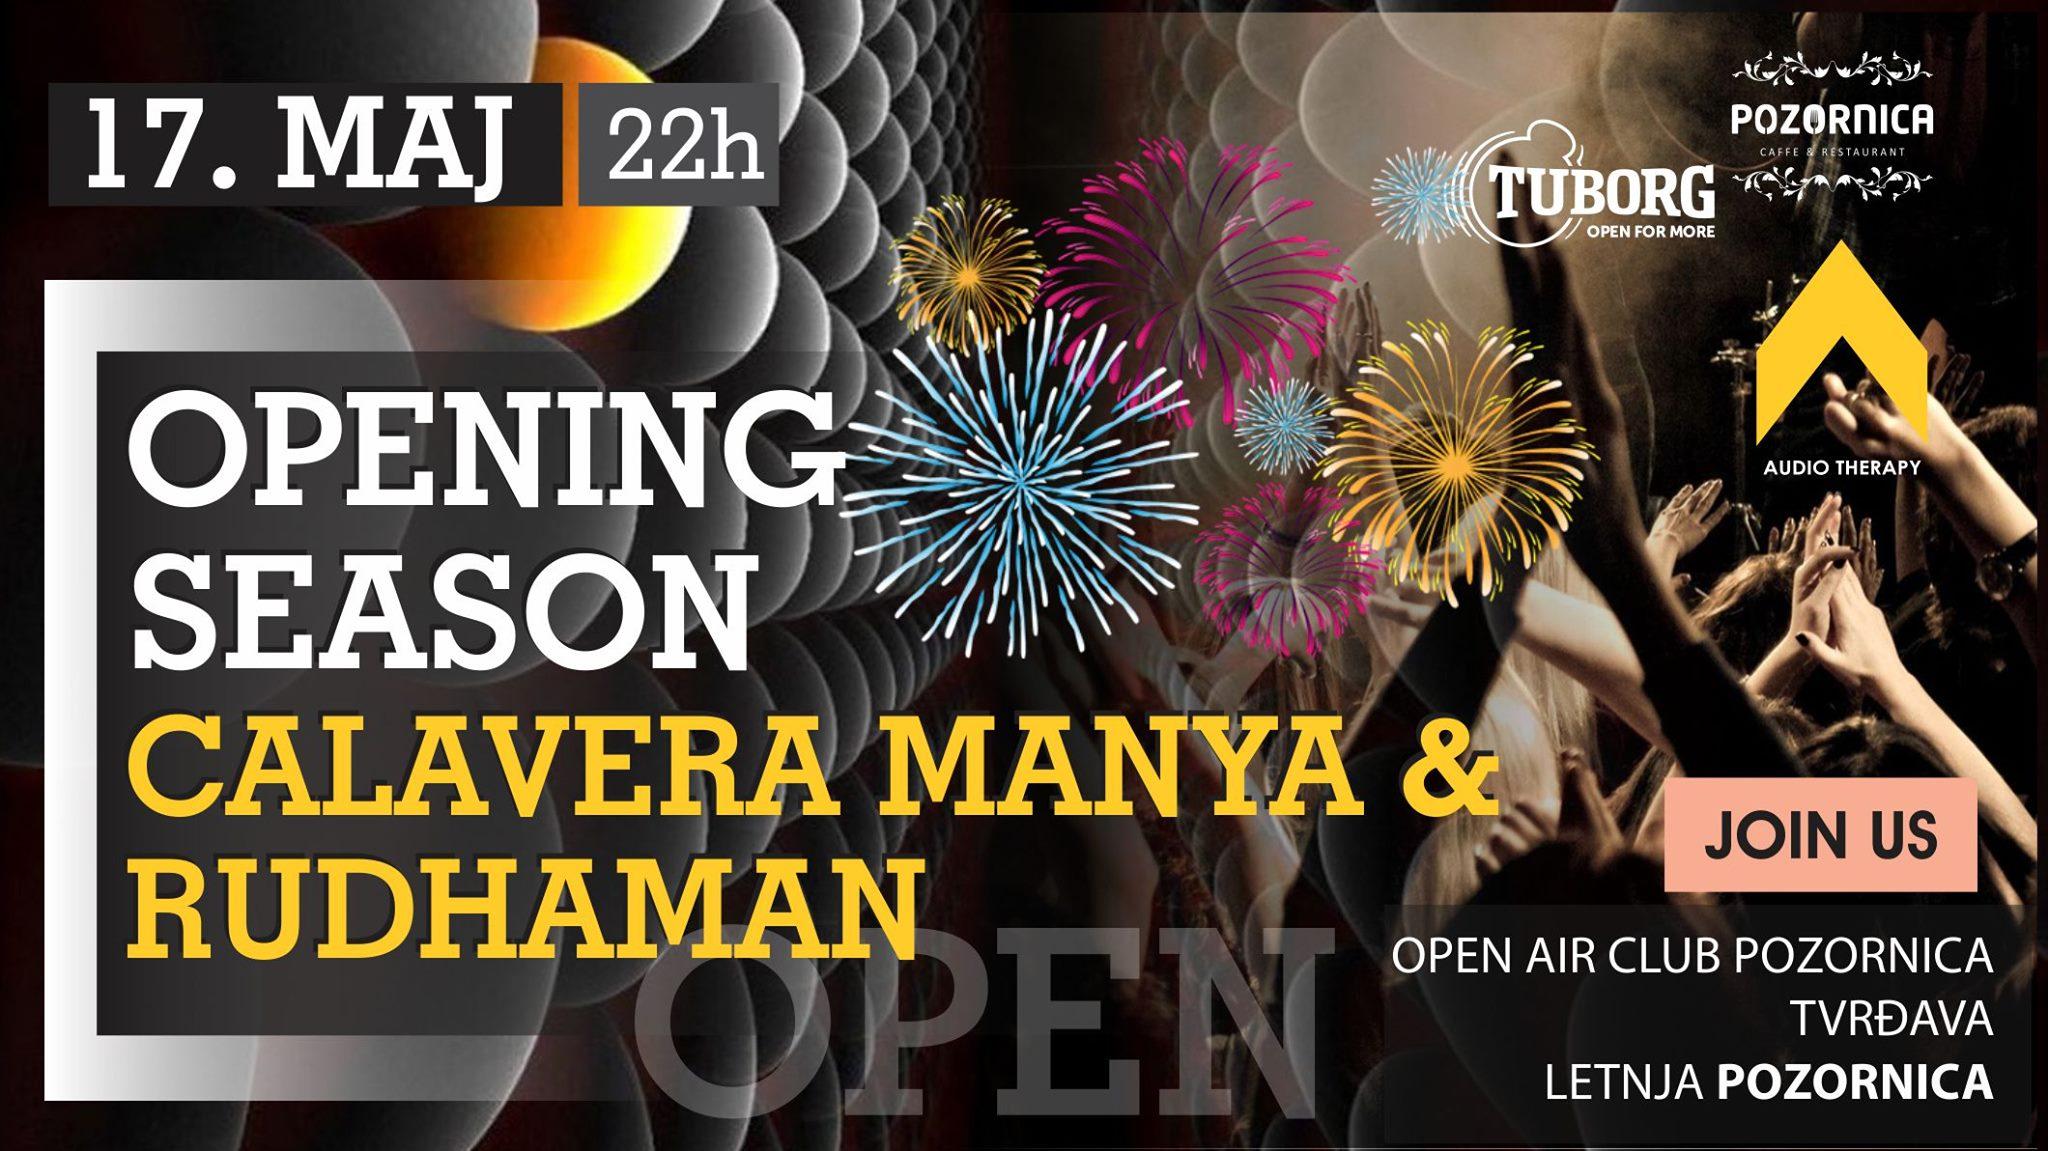 Otvaranje Letnje Sezone 2019 -Calavera Manya & Rudhaman